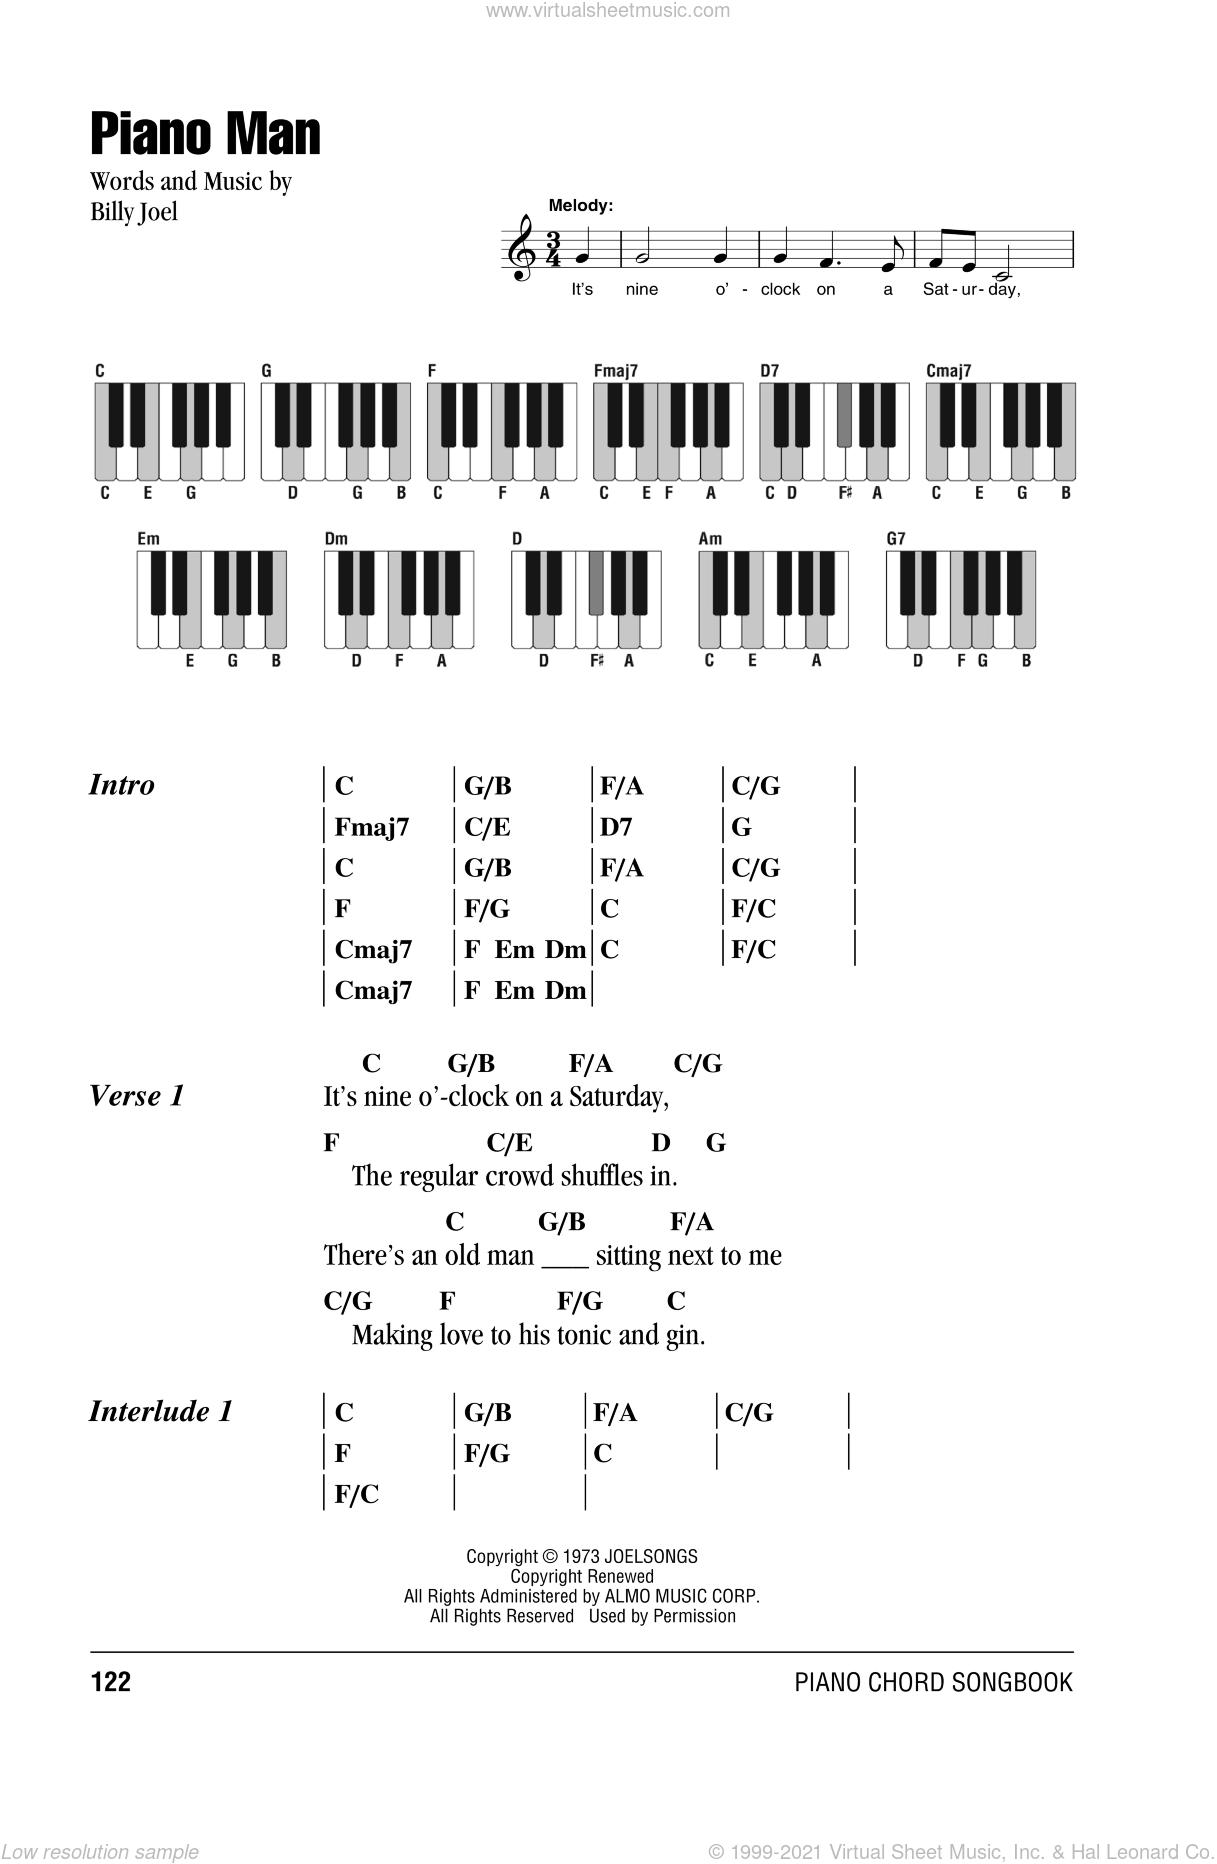 Joel - Piano Man sheet music for piano solo (chords, lyrics, melody)